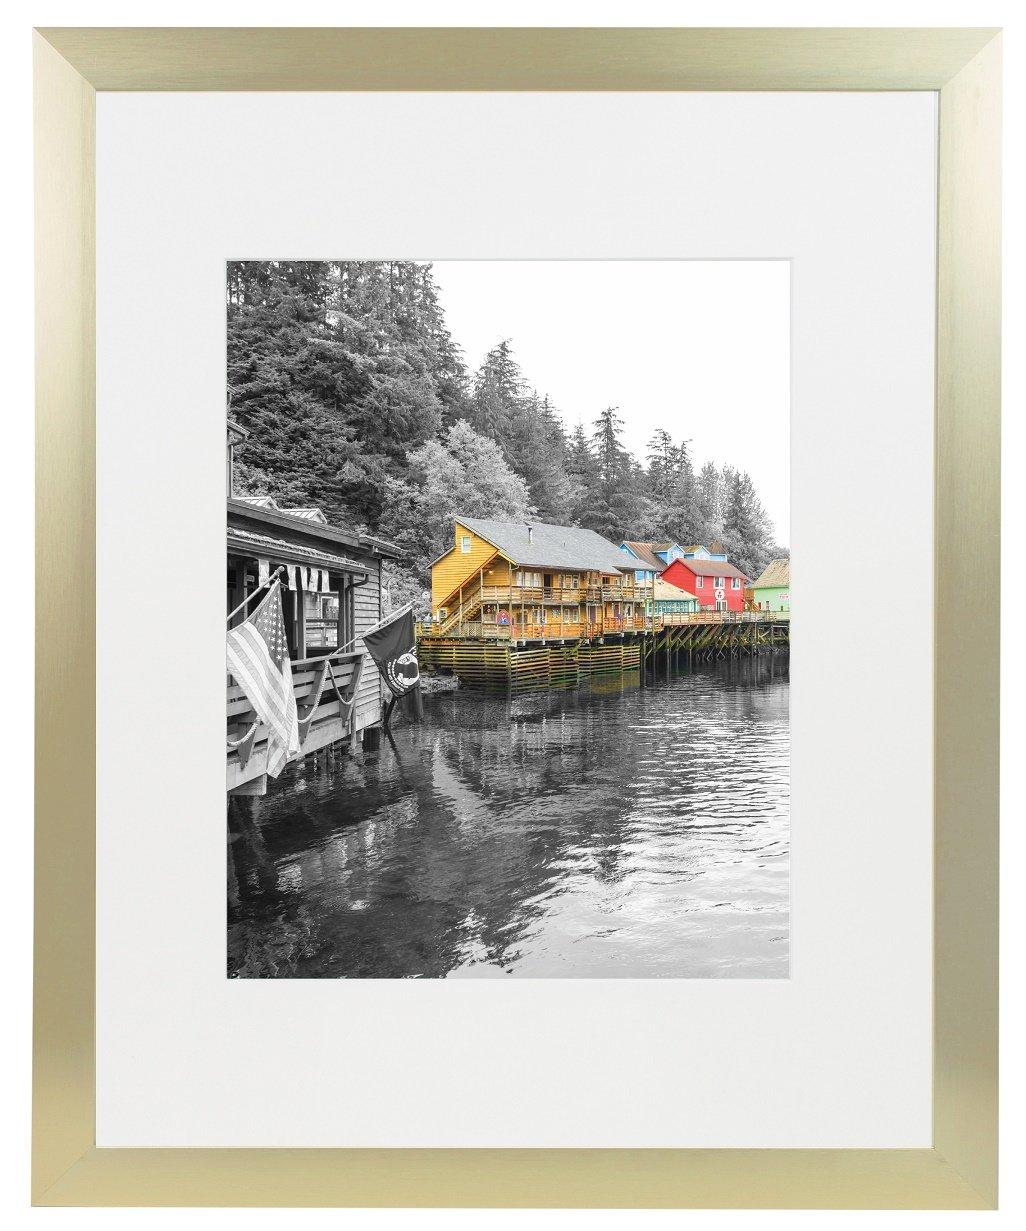 Golden State Art Gold Color Satin Aluminum Landscape Or Portrait Picture Frame With Ivort Color Mat & Real Glass (16x20)